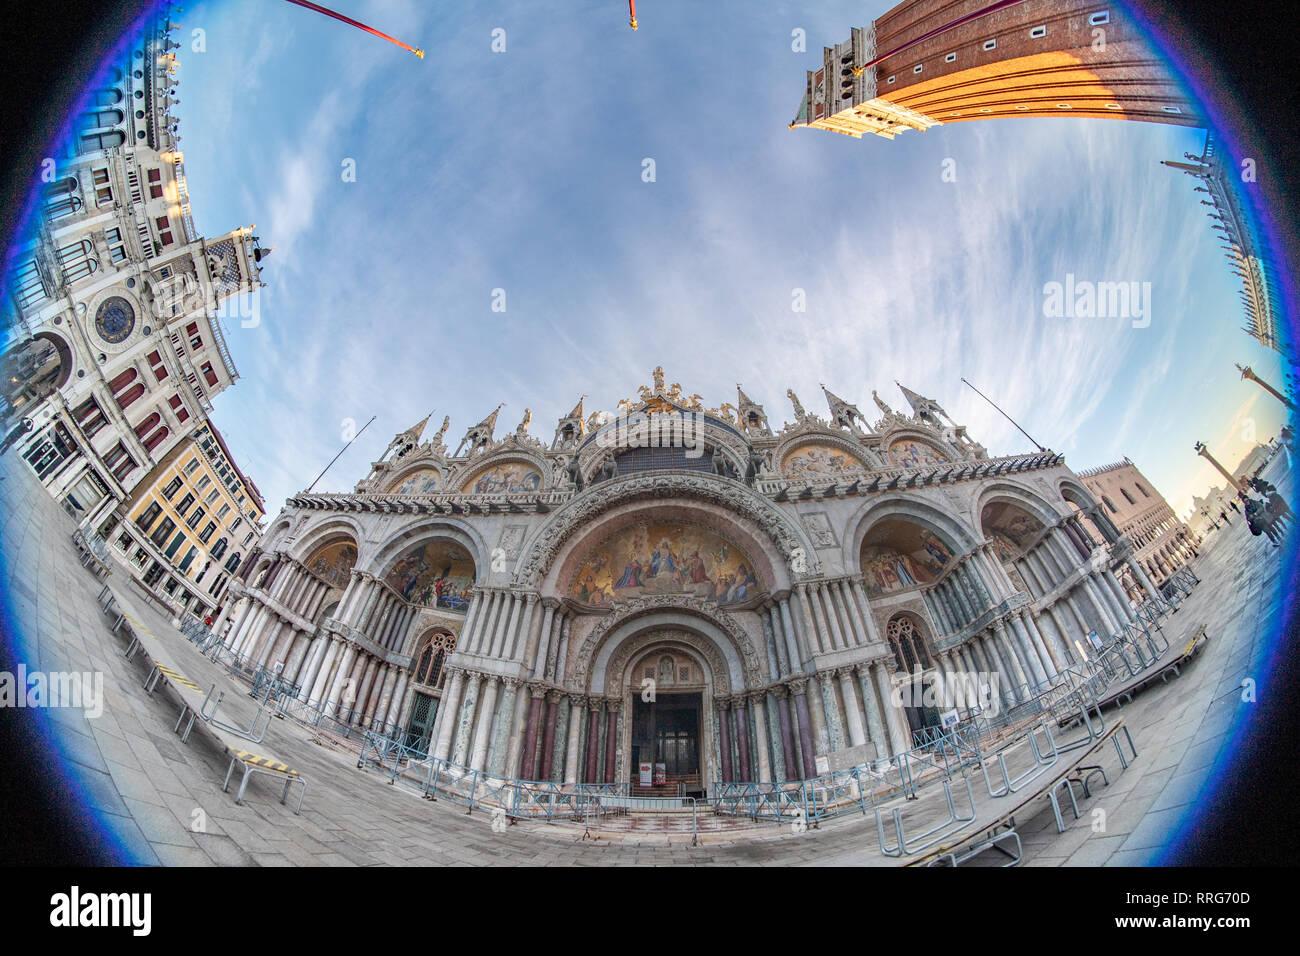 Una vista de ojo de pez de la Basílica de San Marcos en Venecia. A partir de una serie de fotos de viaje en Italia. Foto Fecha: Martes, 12 de febrero de 2019. Foto: Roger Garfield Foto de stock